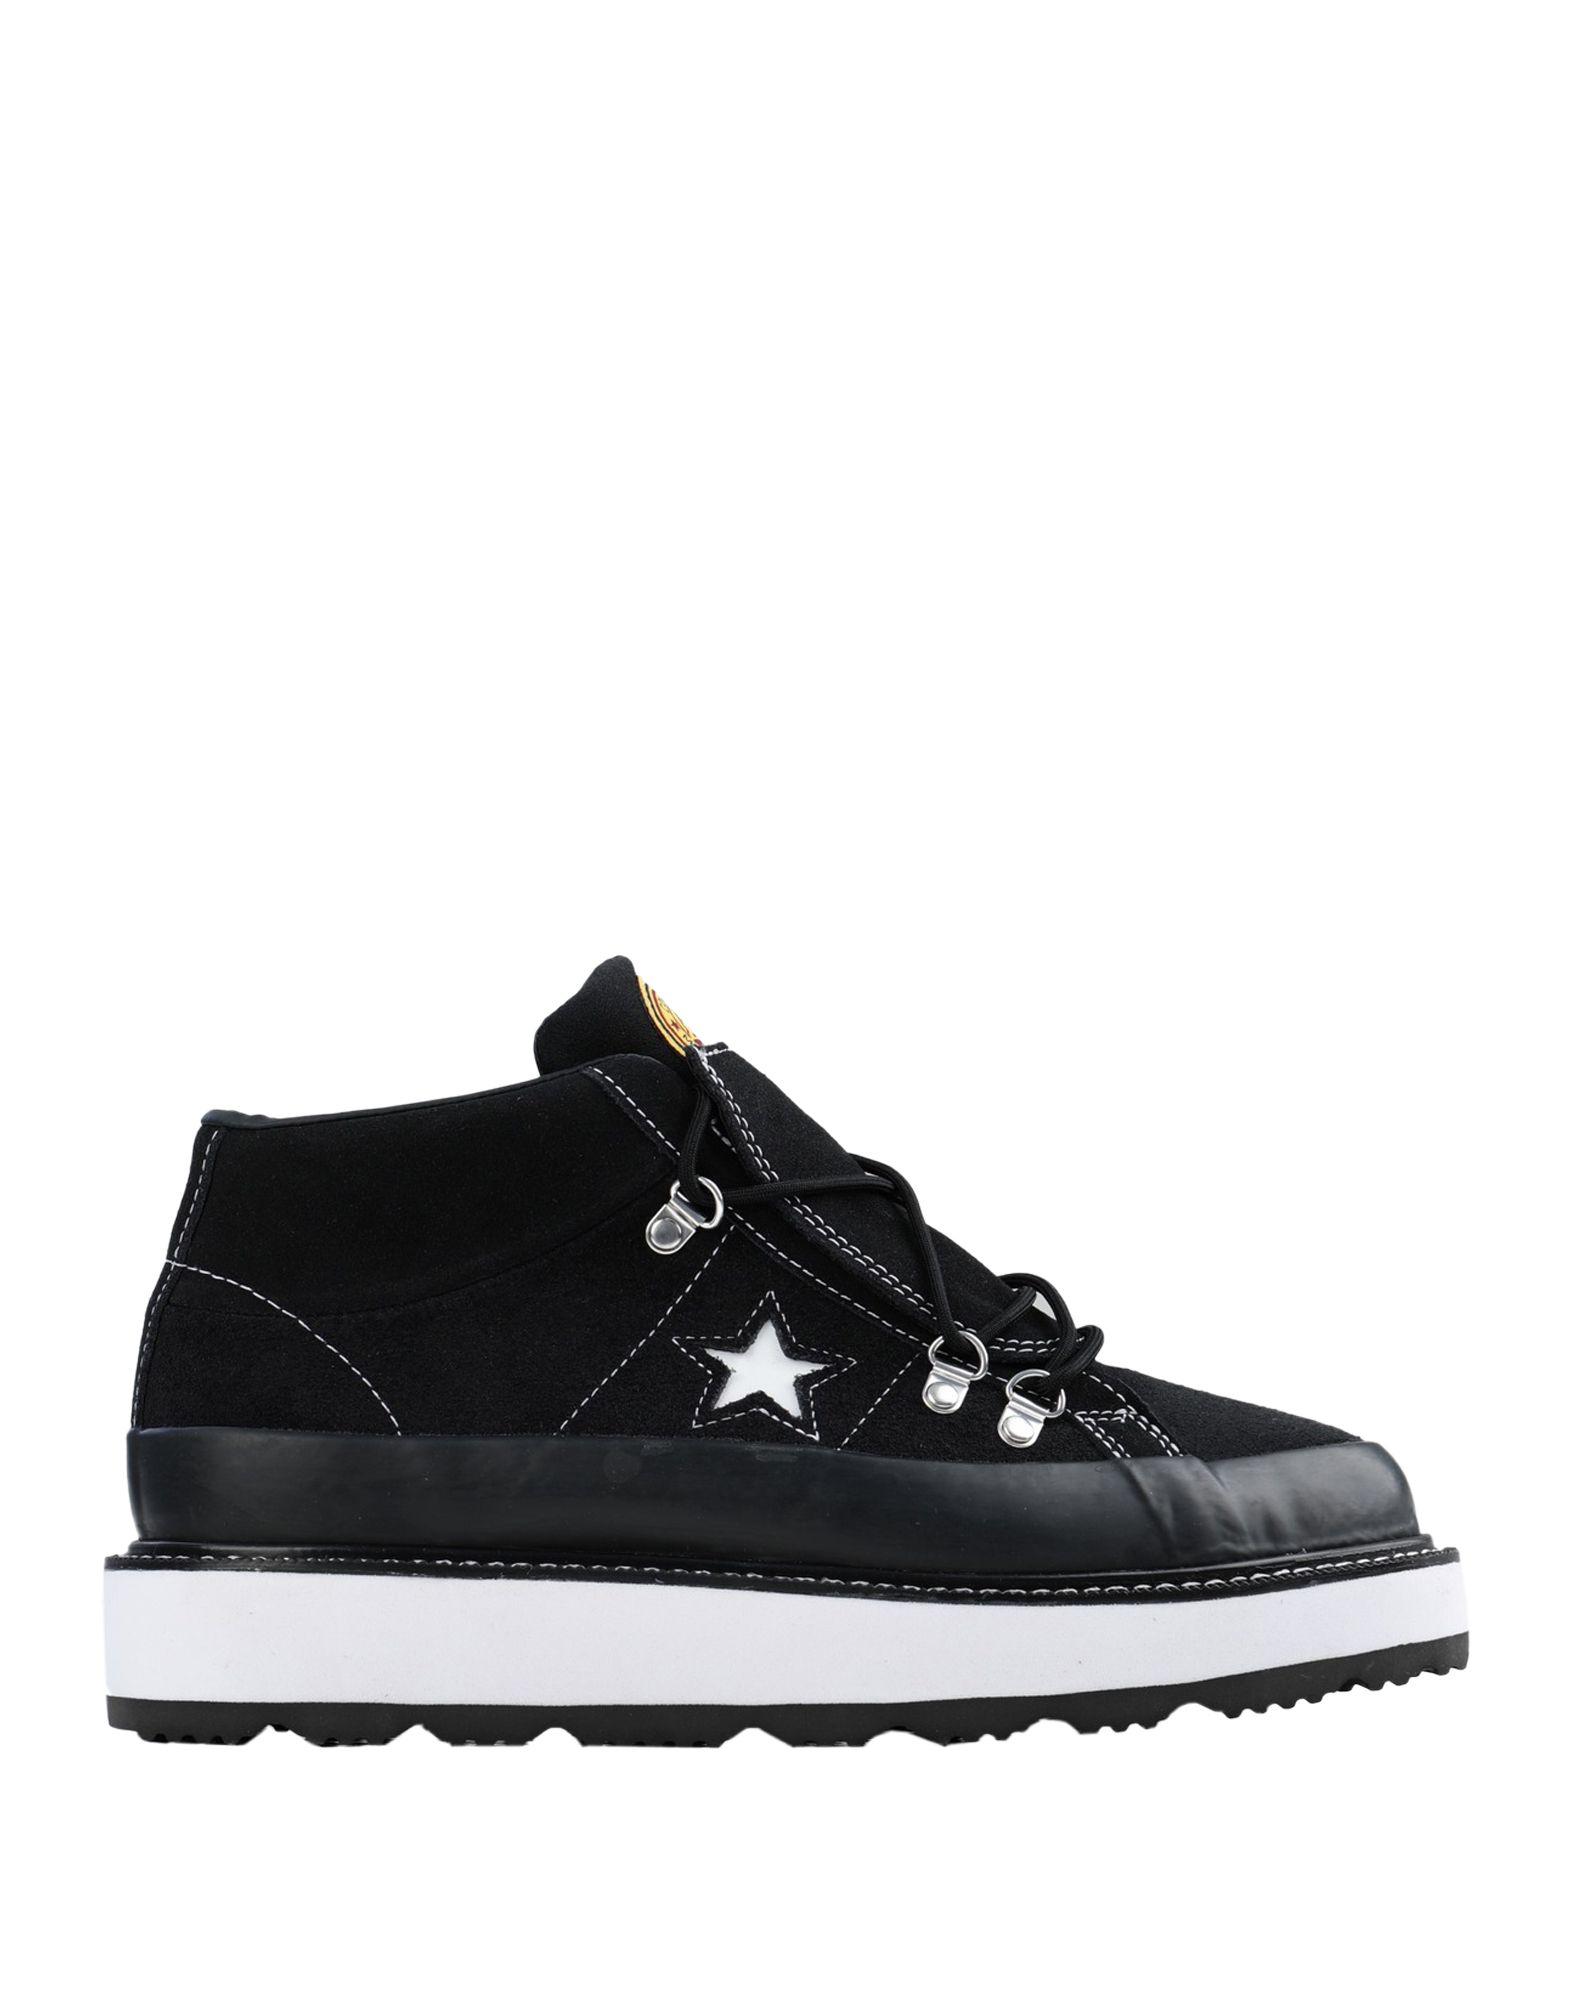 CONVERSE ONE STAR Высокие кеды и кроссовки one footwear высокие кеды